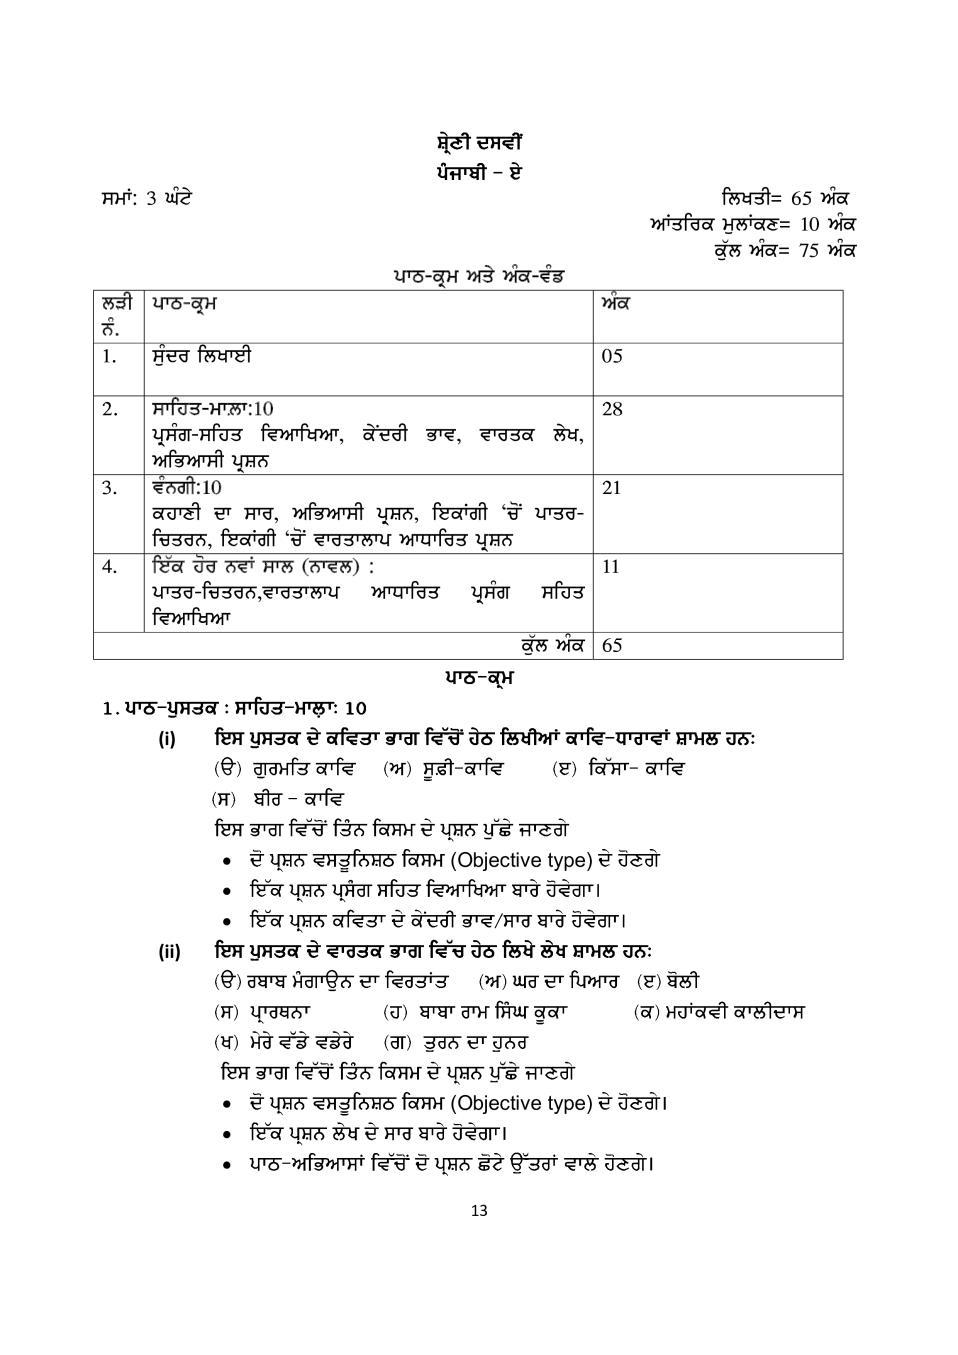 PSEB Syllabus 2020-21 for Class 10 Punjabi - Page 1